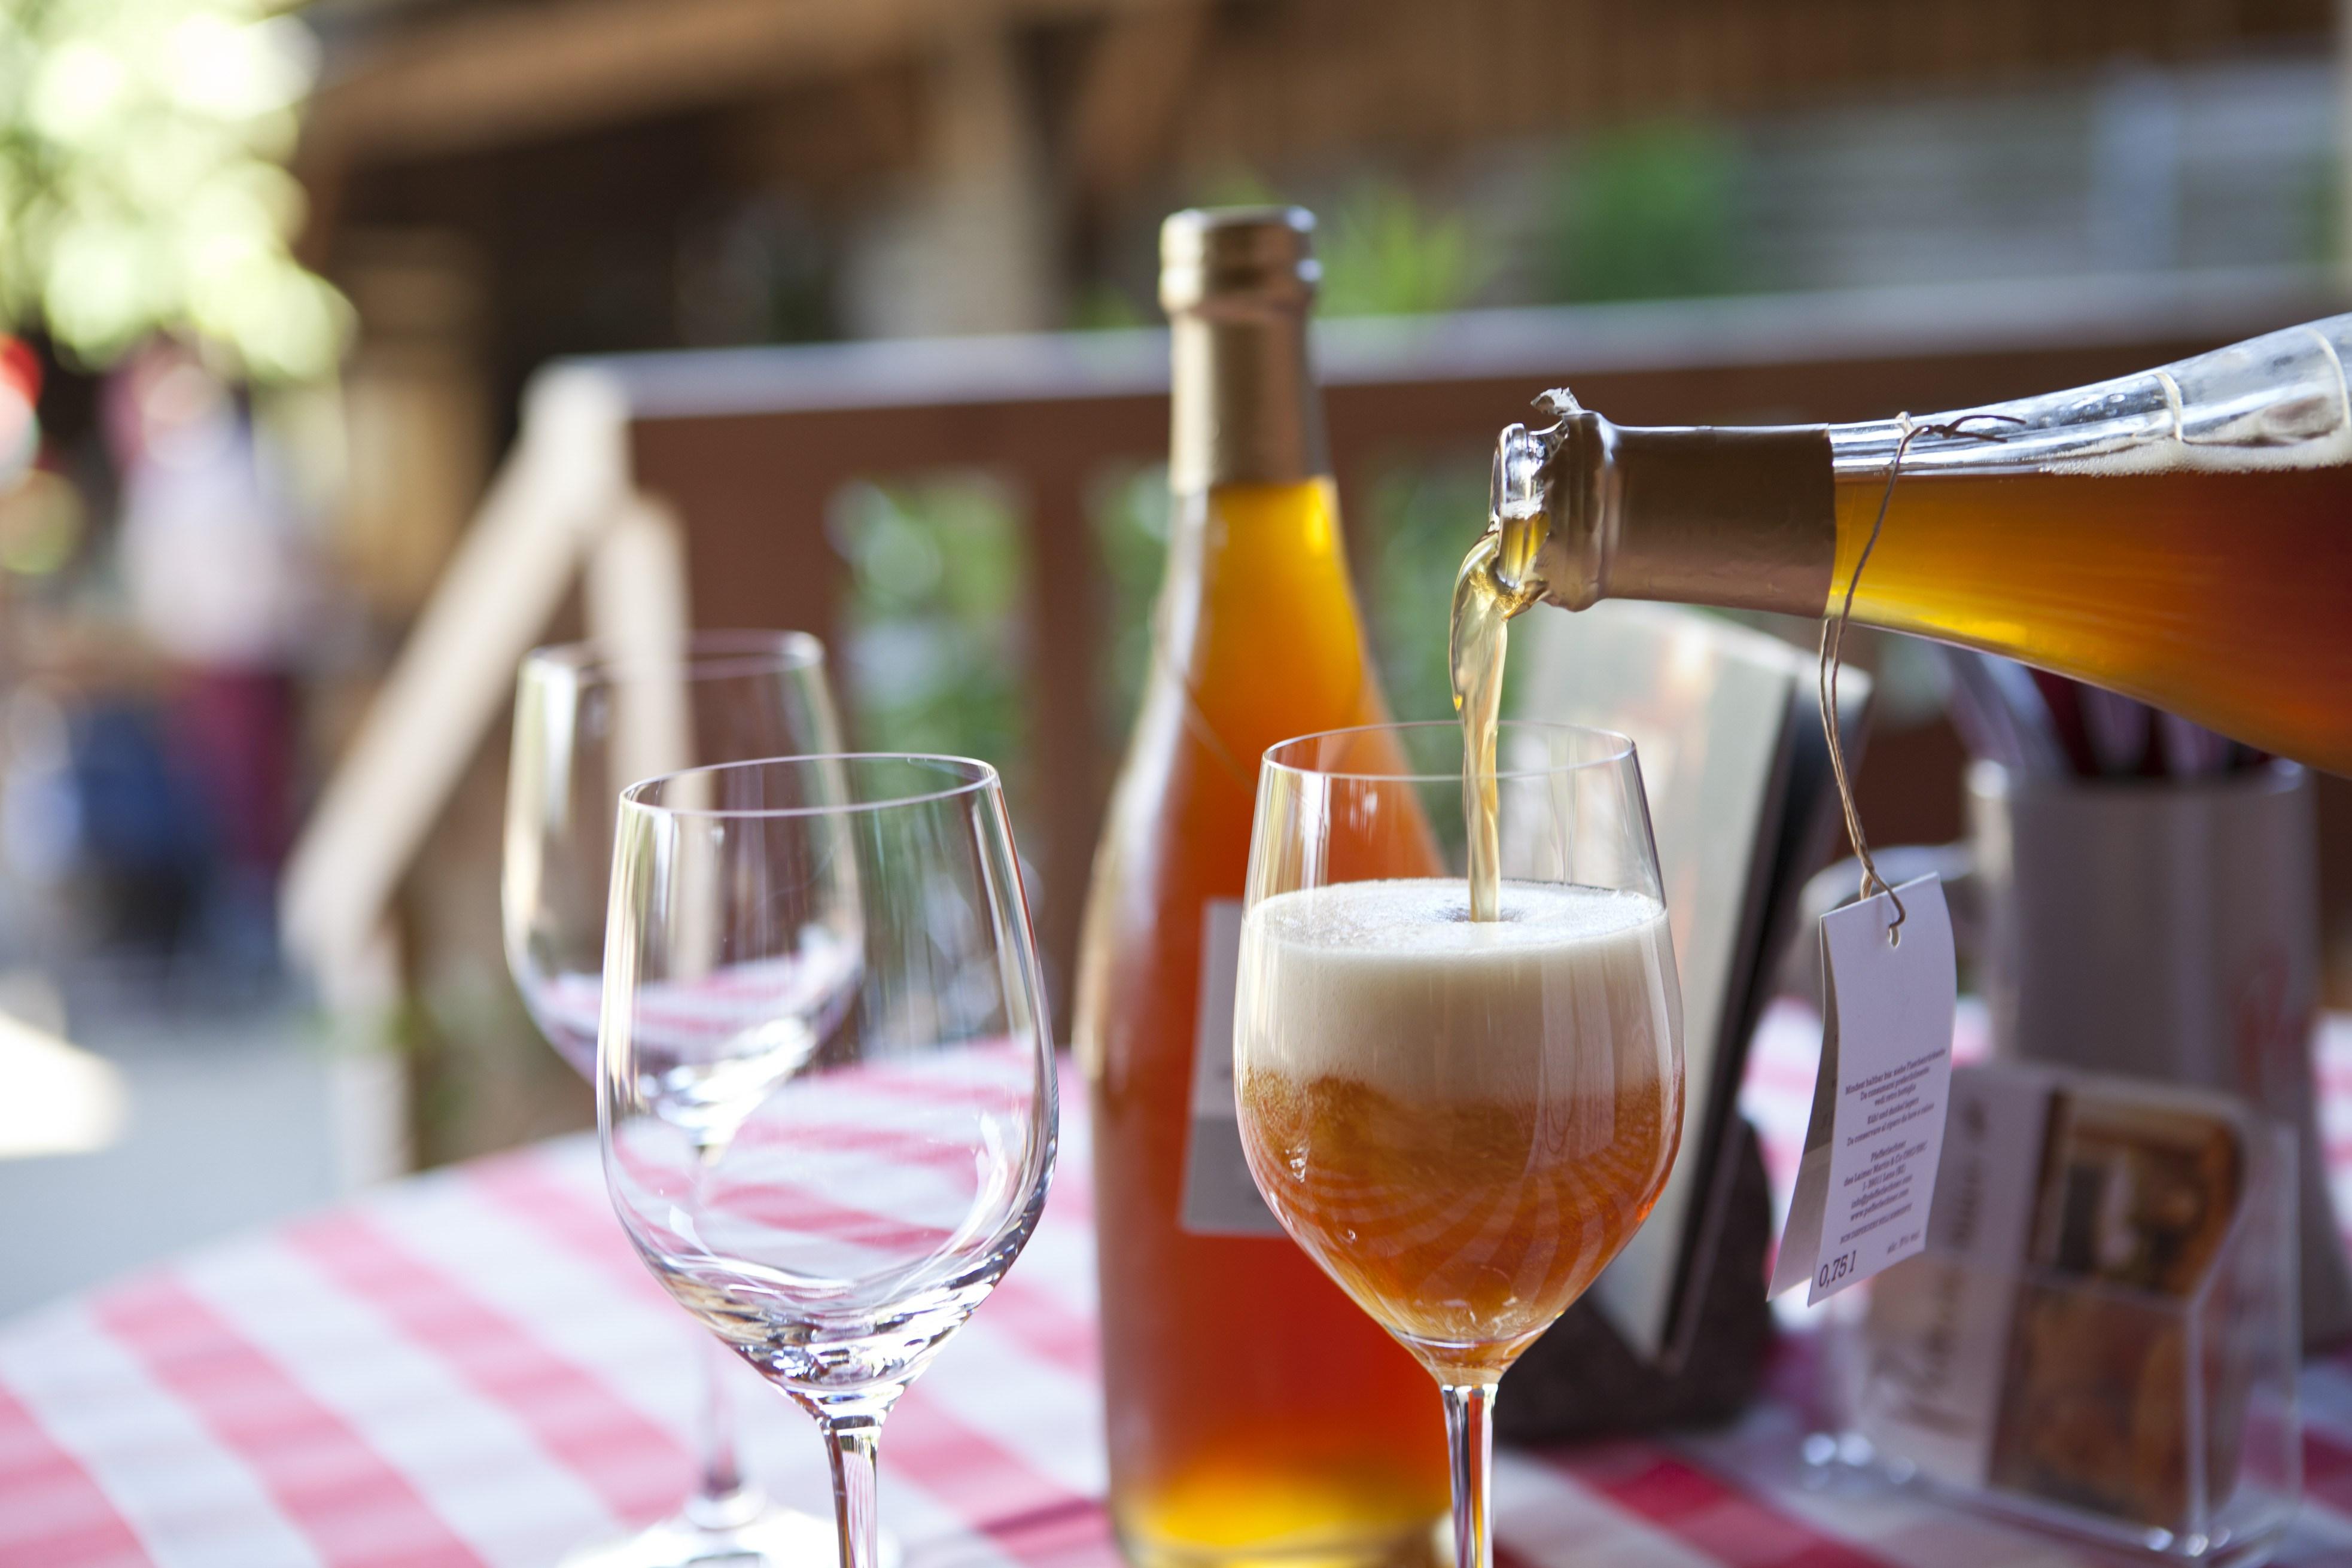 BERE BUONA BIRRA - Крафтовое пиво в Милане: 5 заведений